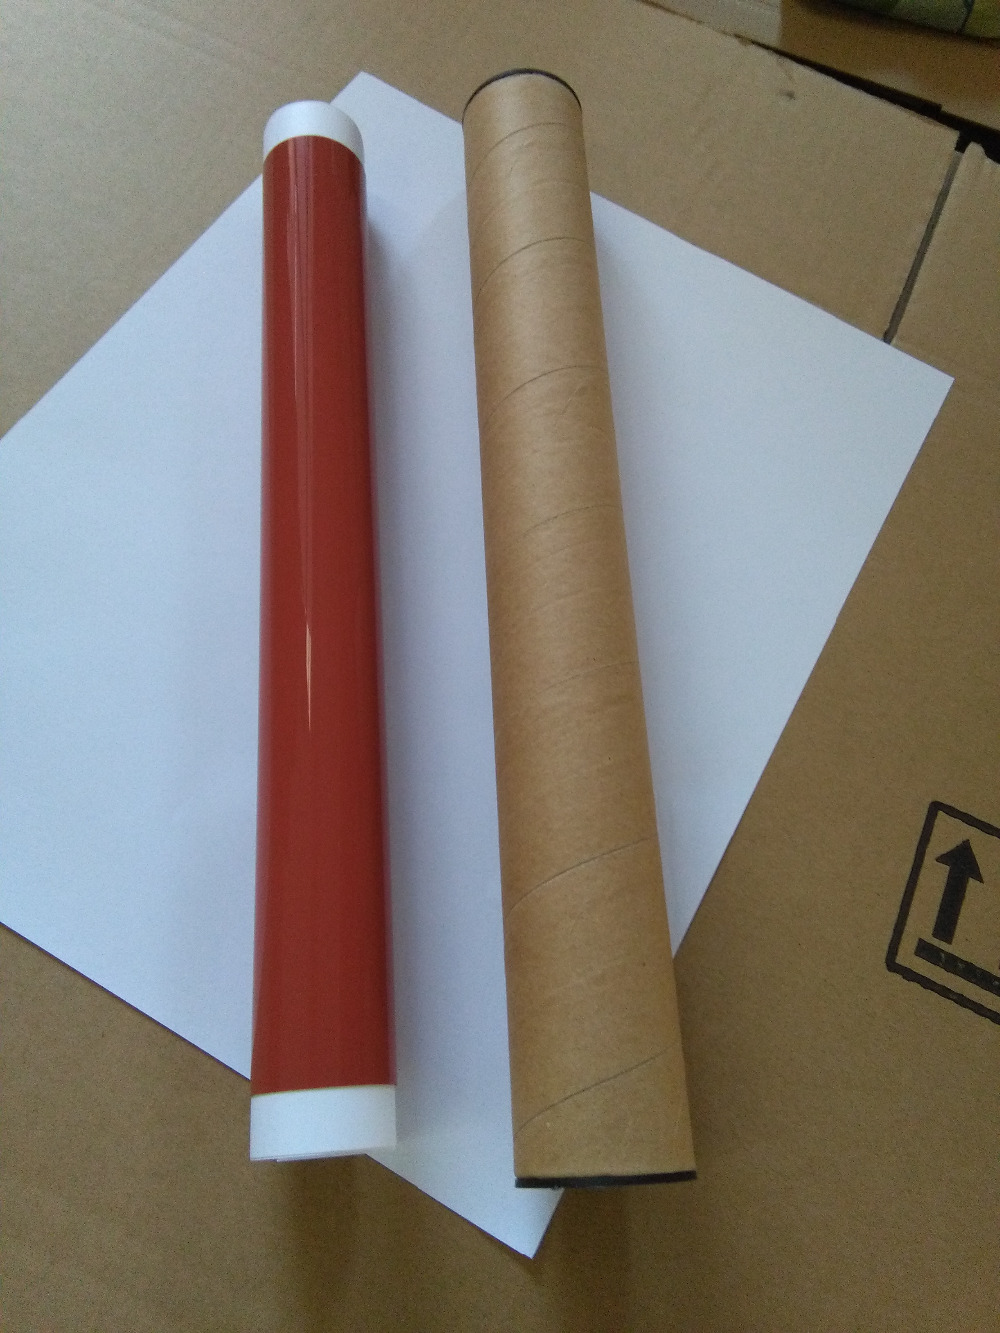 higher quality fuser film sleeve For Konica Minolta bizhub C451 C550 C660 C452 C552 C652 fuser sleeve